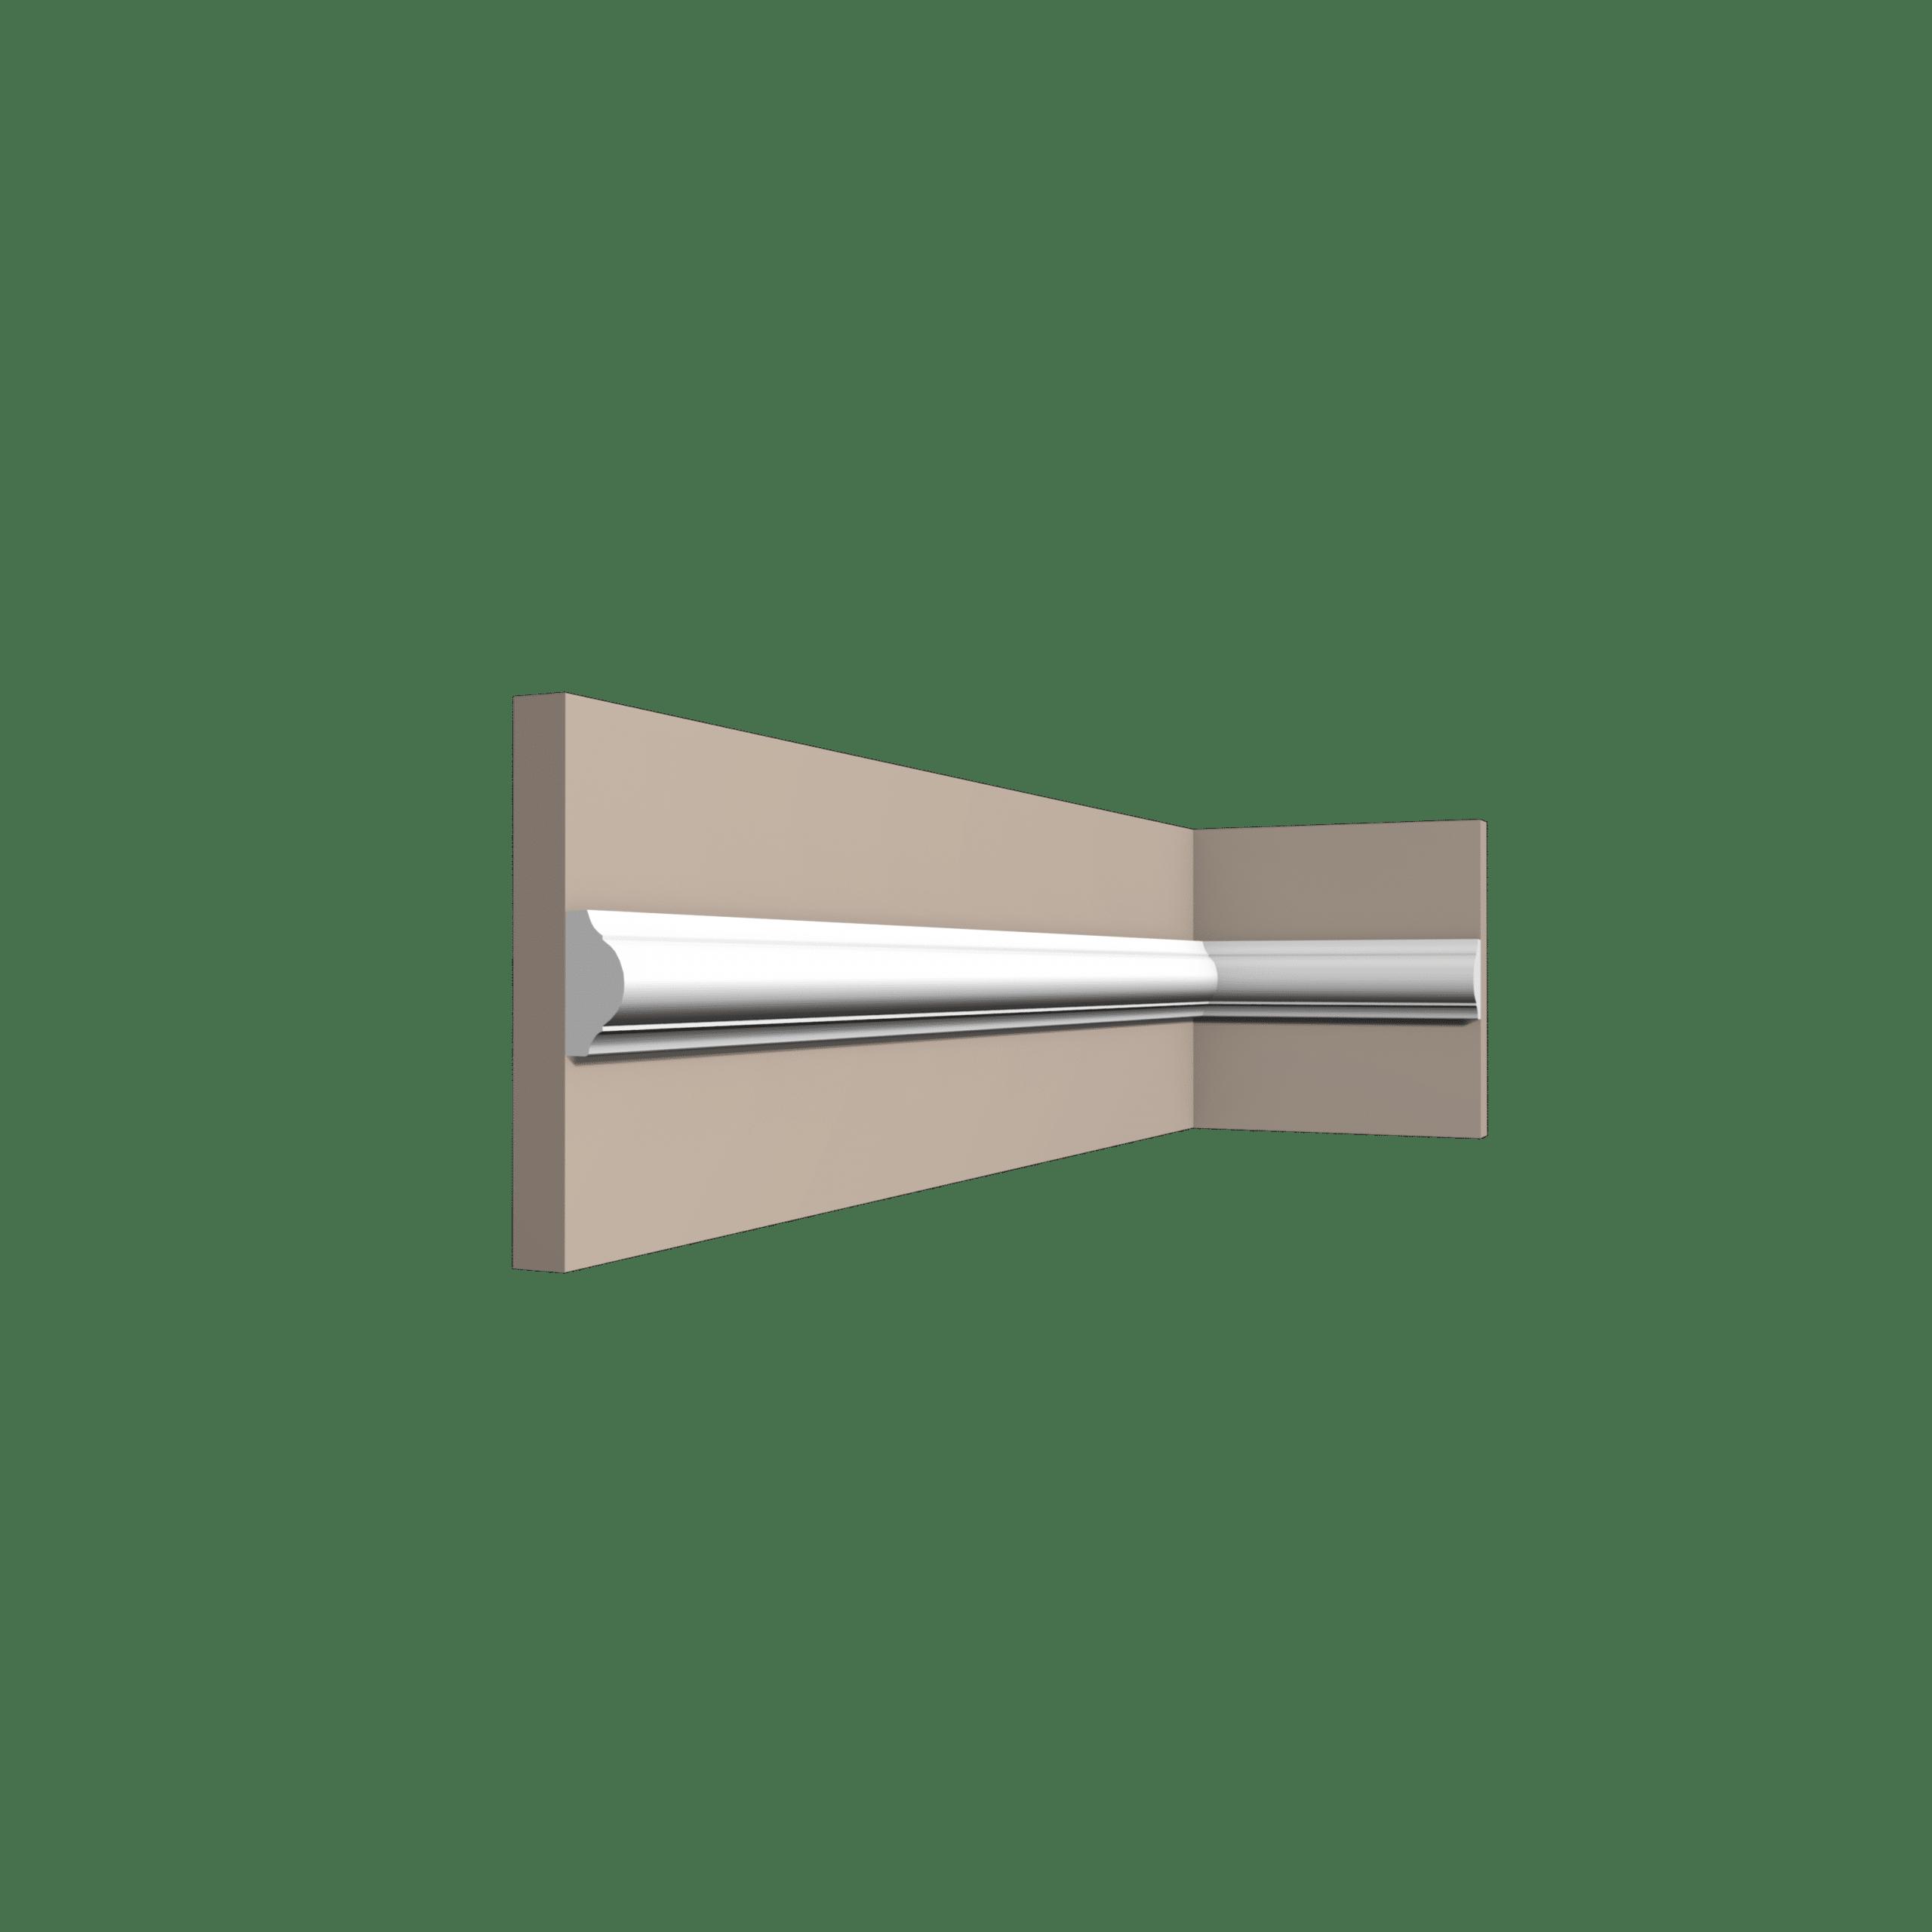 קרניז פוליאוריתן דגם DS - 2635